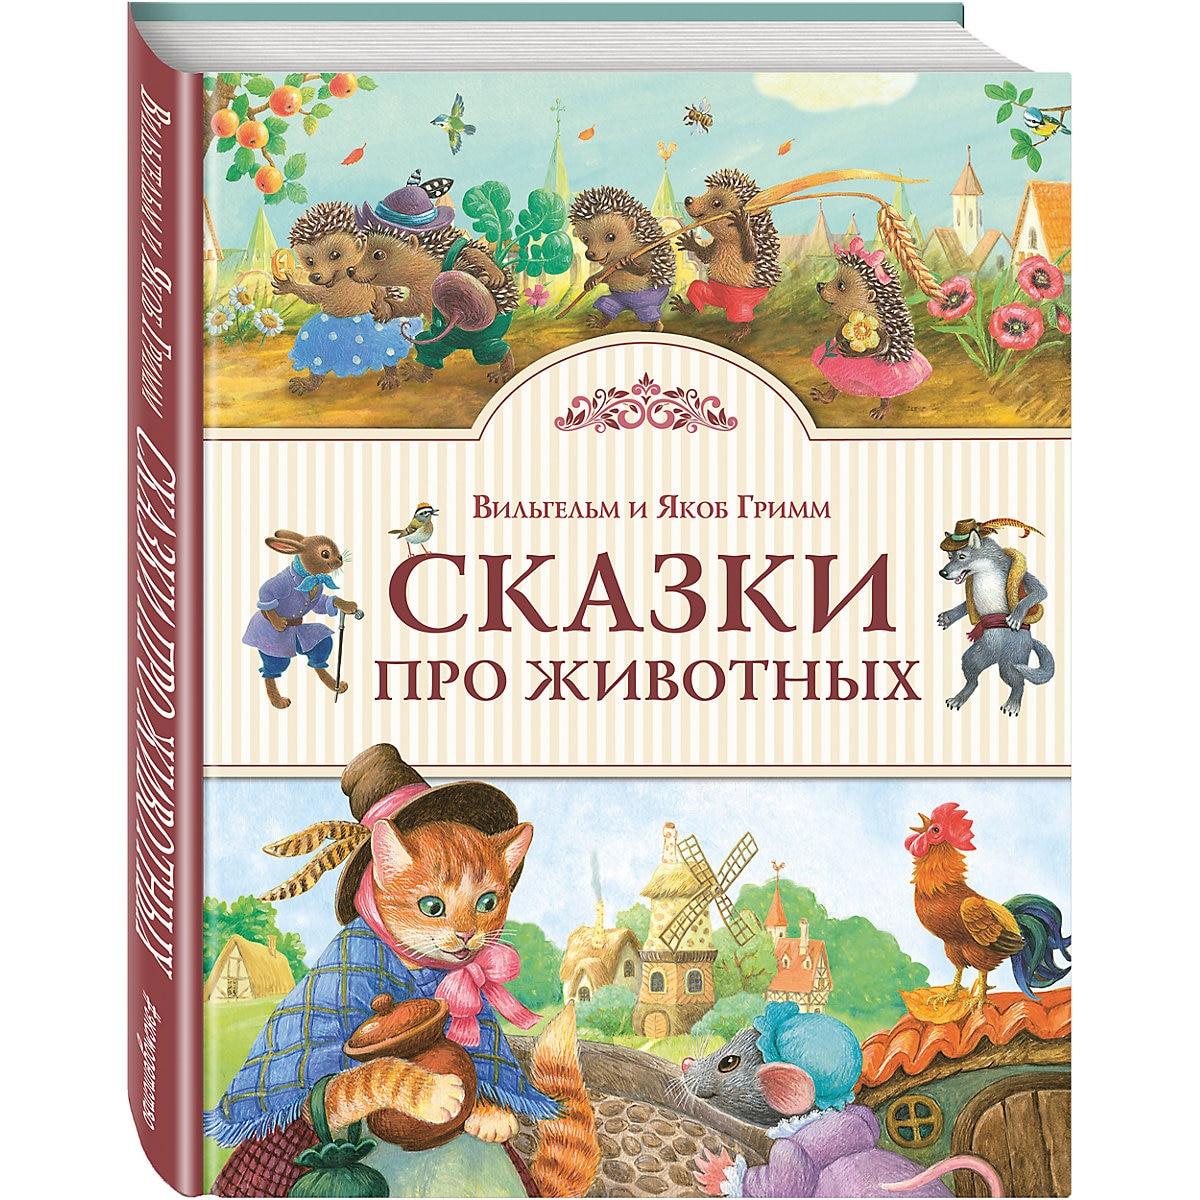 Books EKSMO 5535387 Children Education Encyclopedia Alphabet Dictionary Book For Baby MTpromo